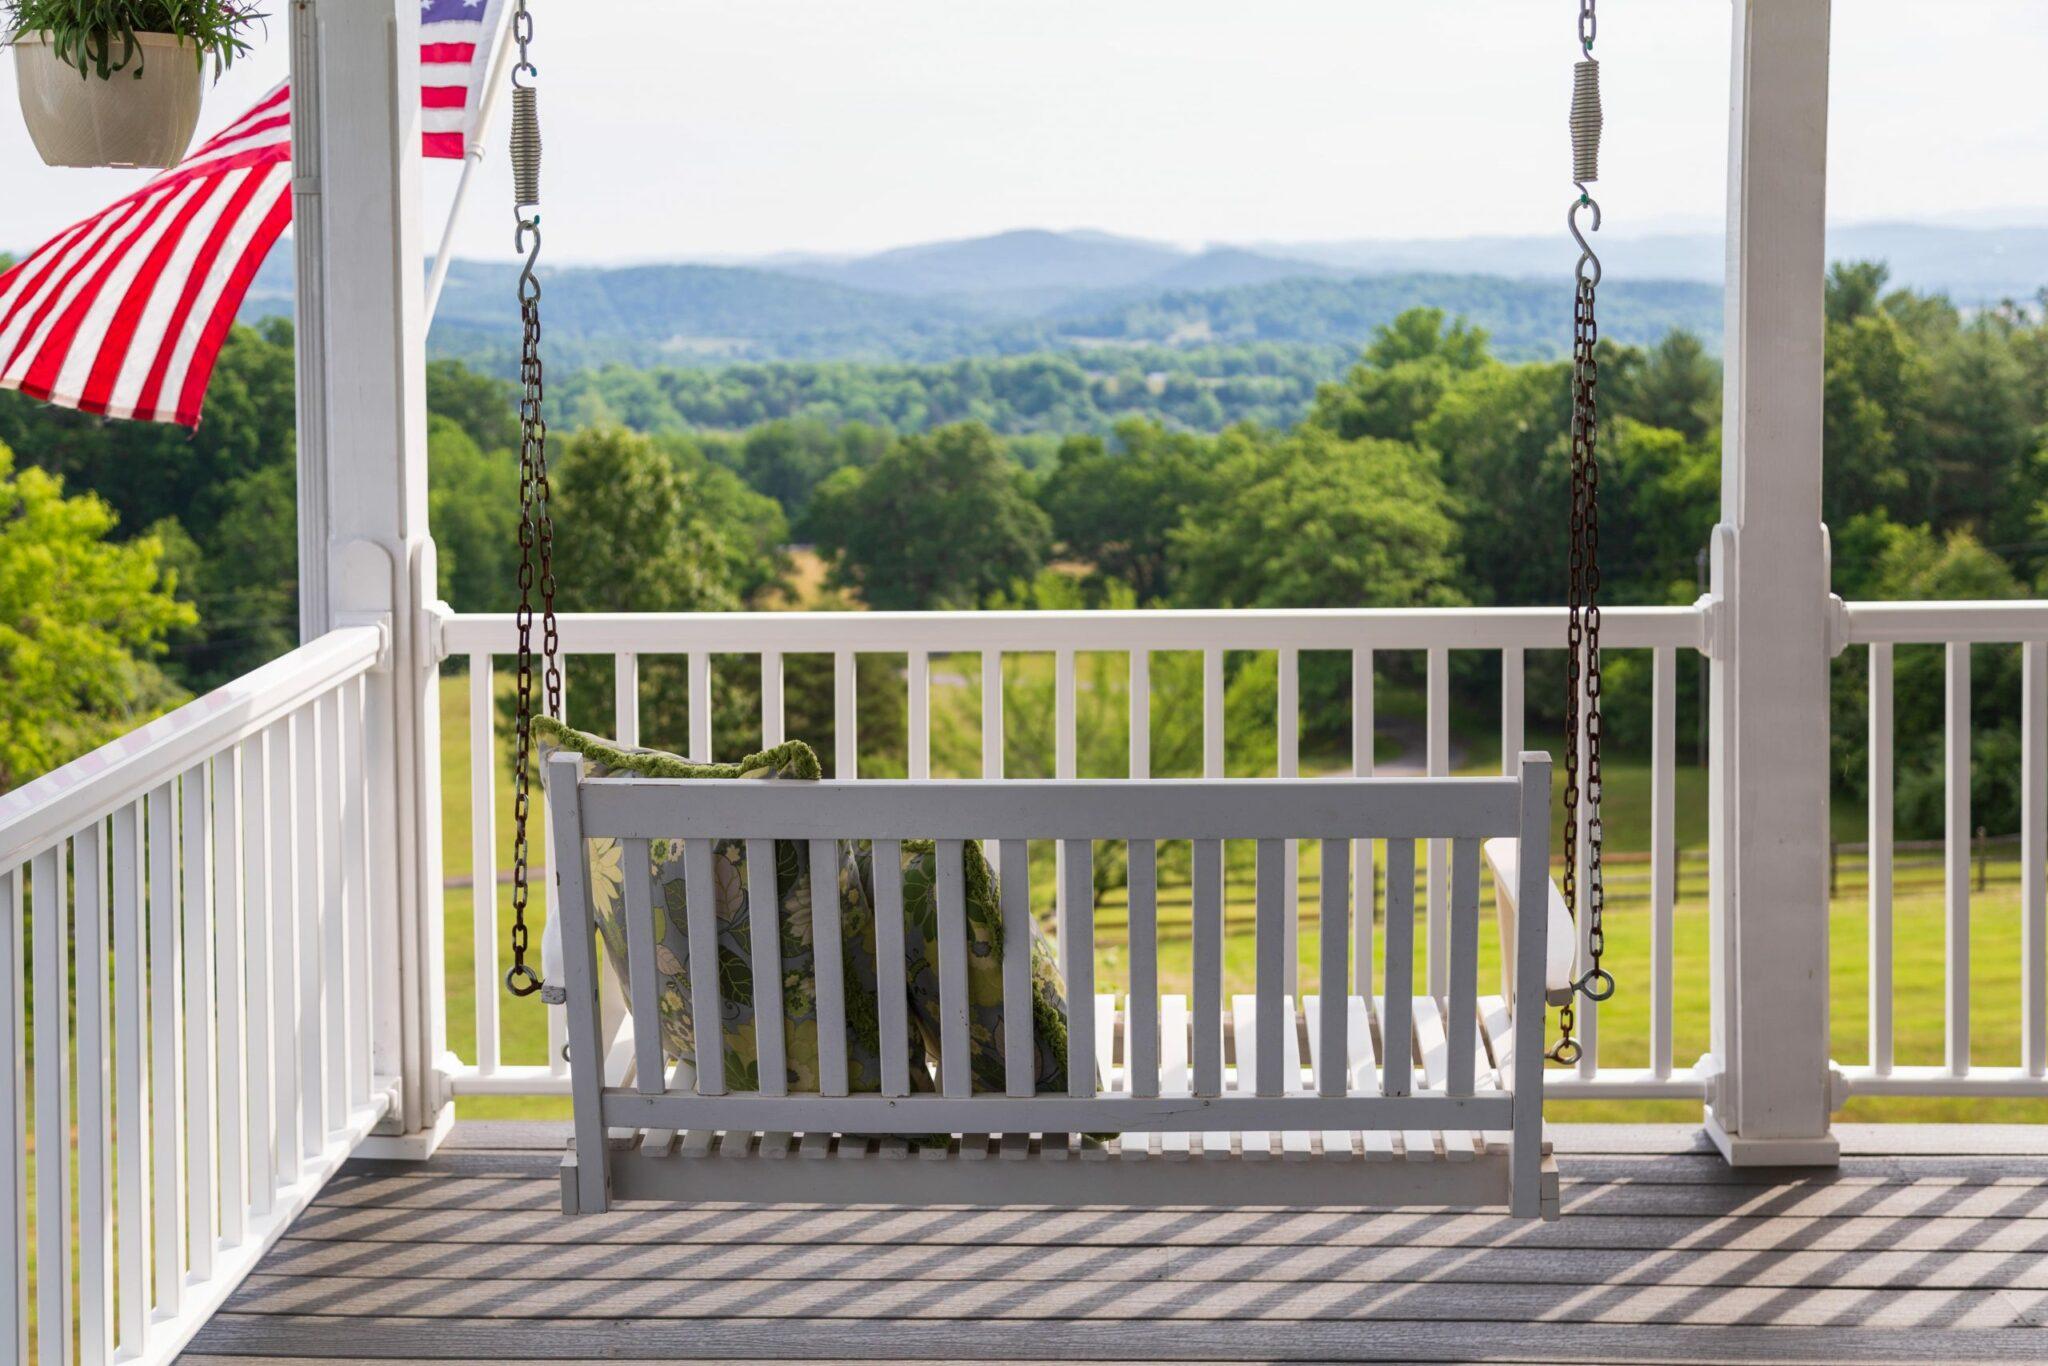 Brierley-Hill-T-Gardens-Porch-2-min